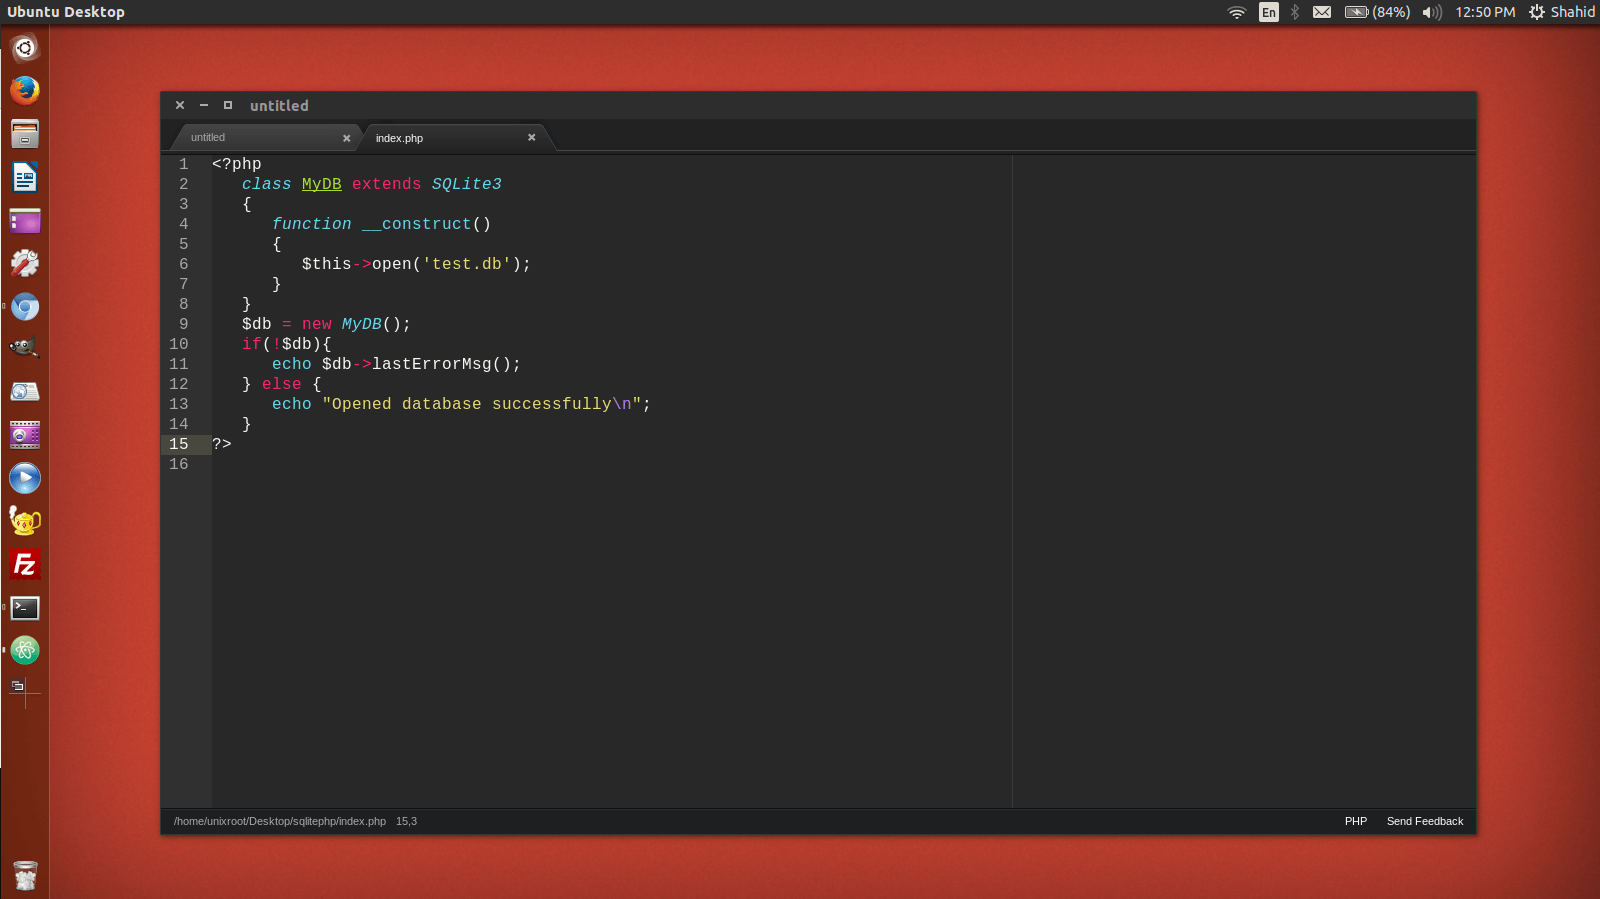 Atom editor in Ubuntu